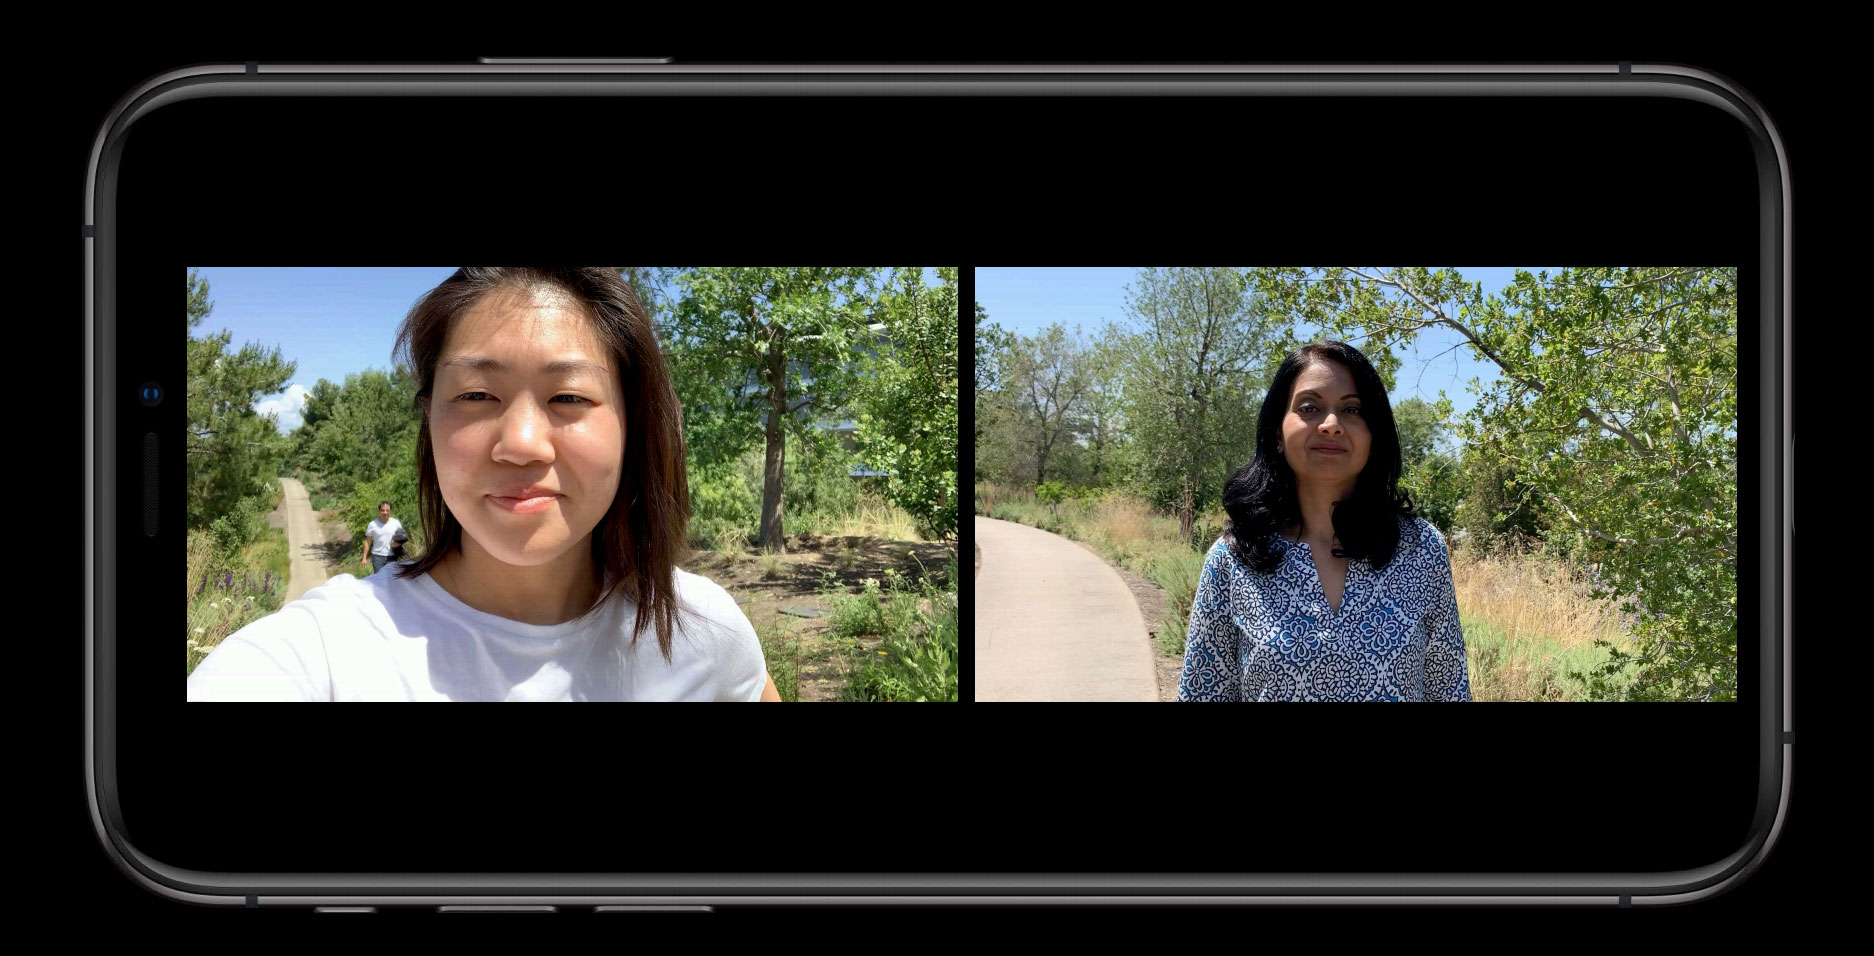 iOS 13 front and back camera shots